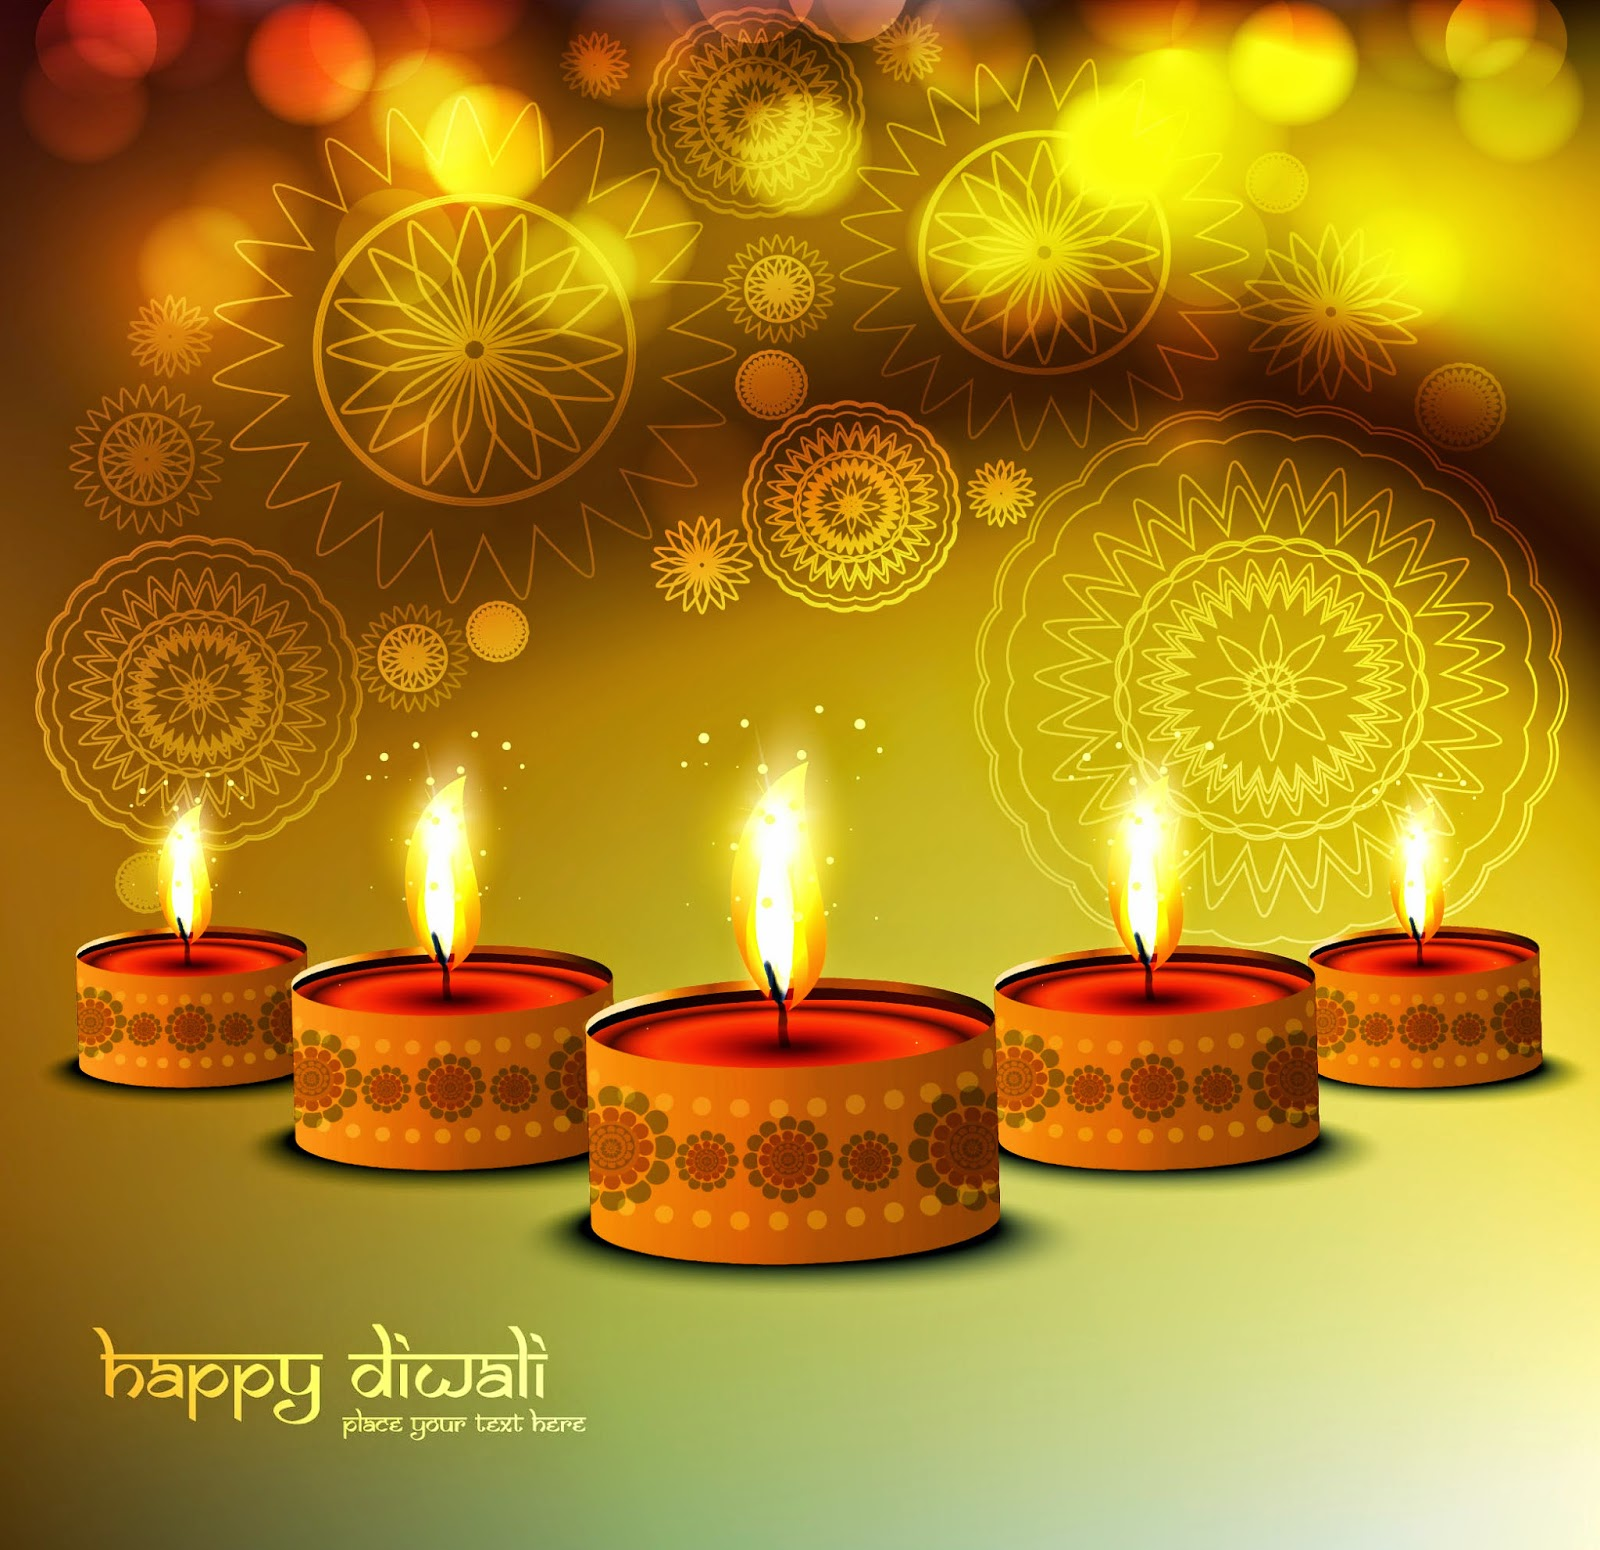 Happy diwali vector collection | naveengfx